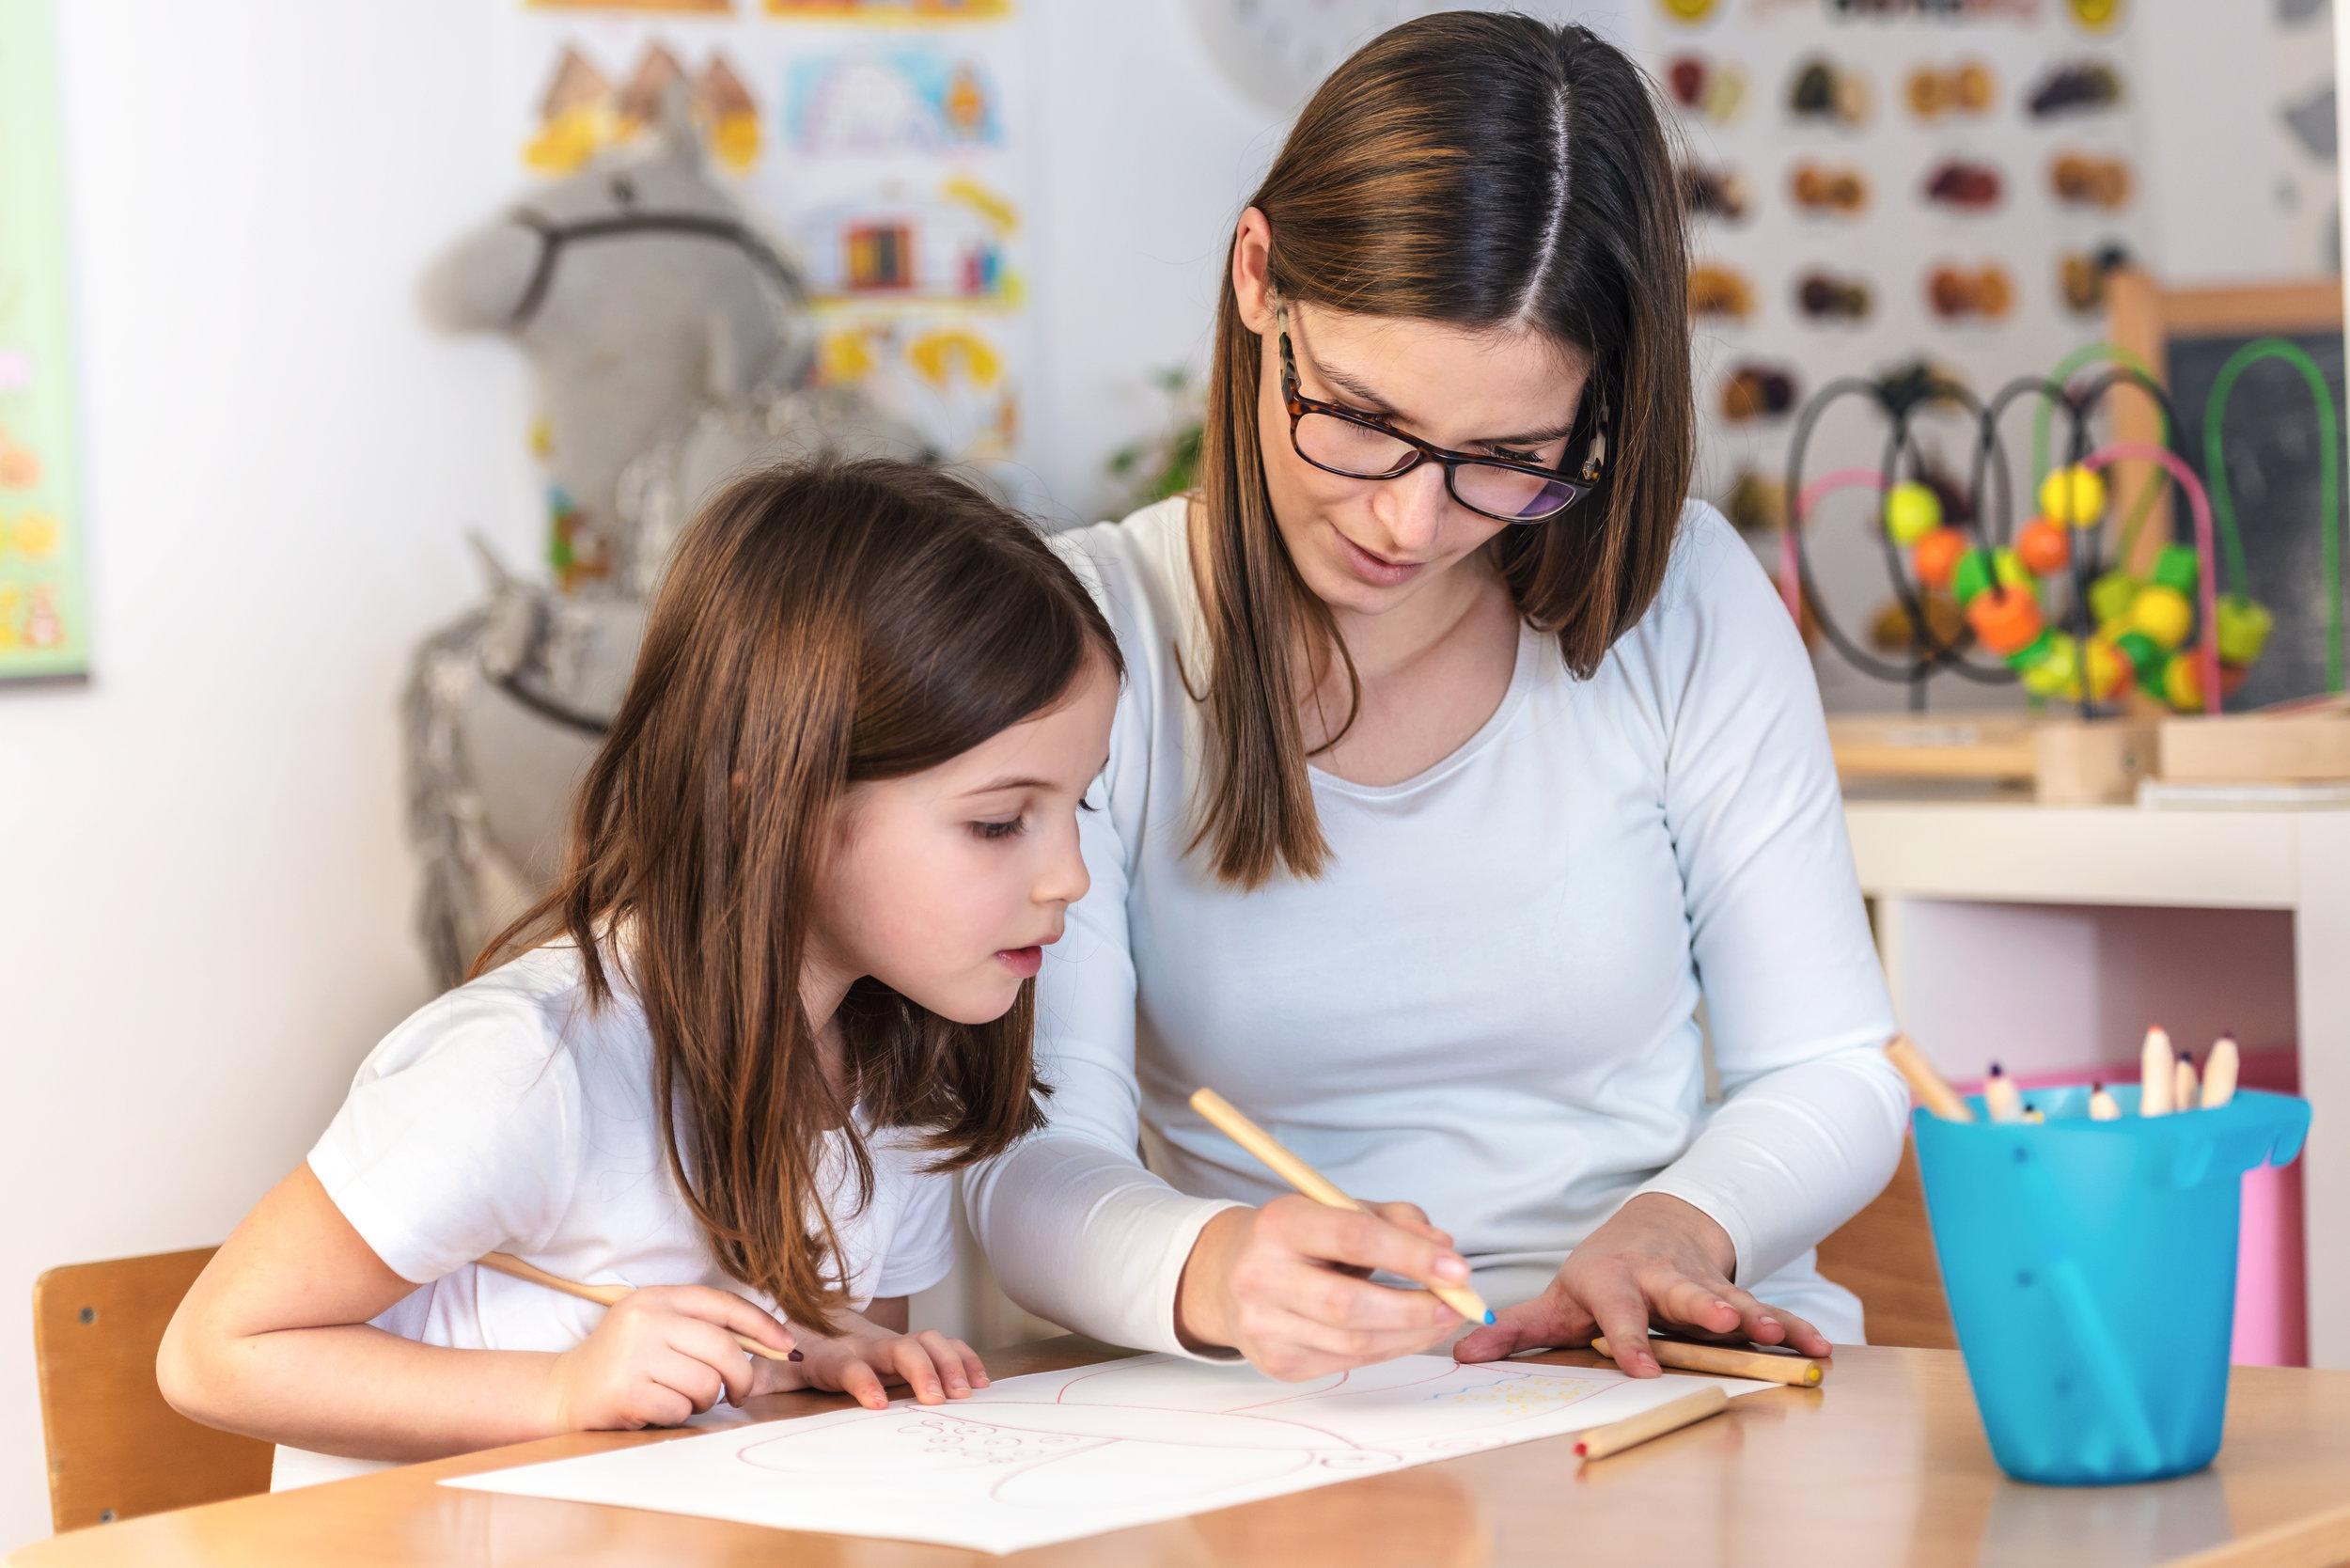 Hauswärts Kinderbetreuung/ Kleinkindbetreuung